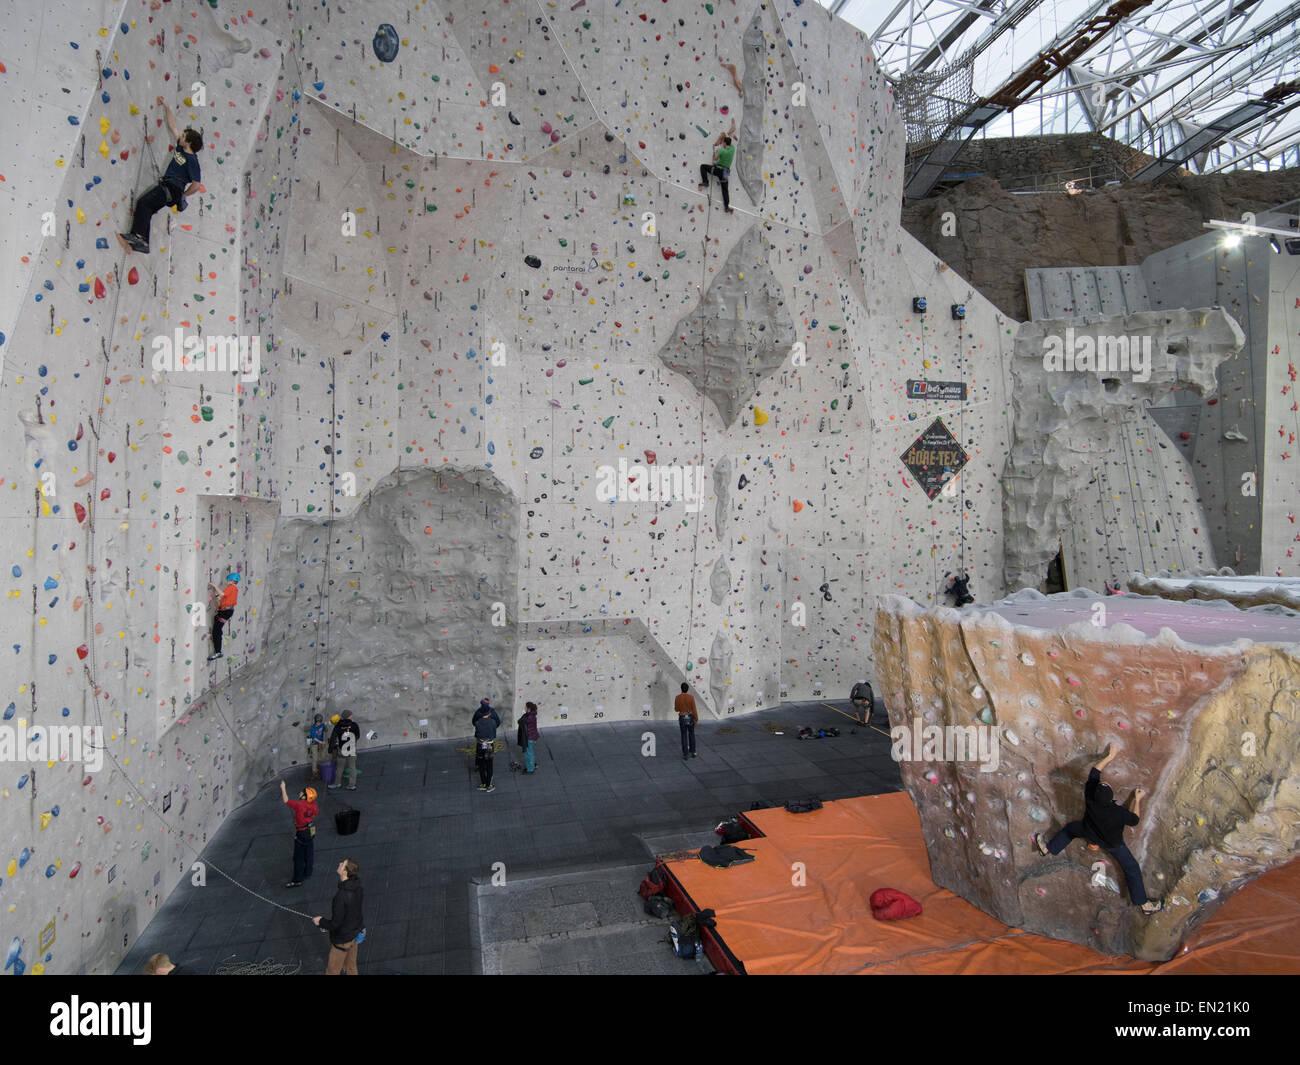 Edinburgh International Climbing Arena - World's largest indoor climbing area. Ratho, nr Edinburgh, Scotland. - Stock Image